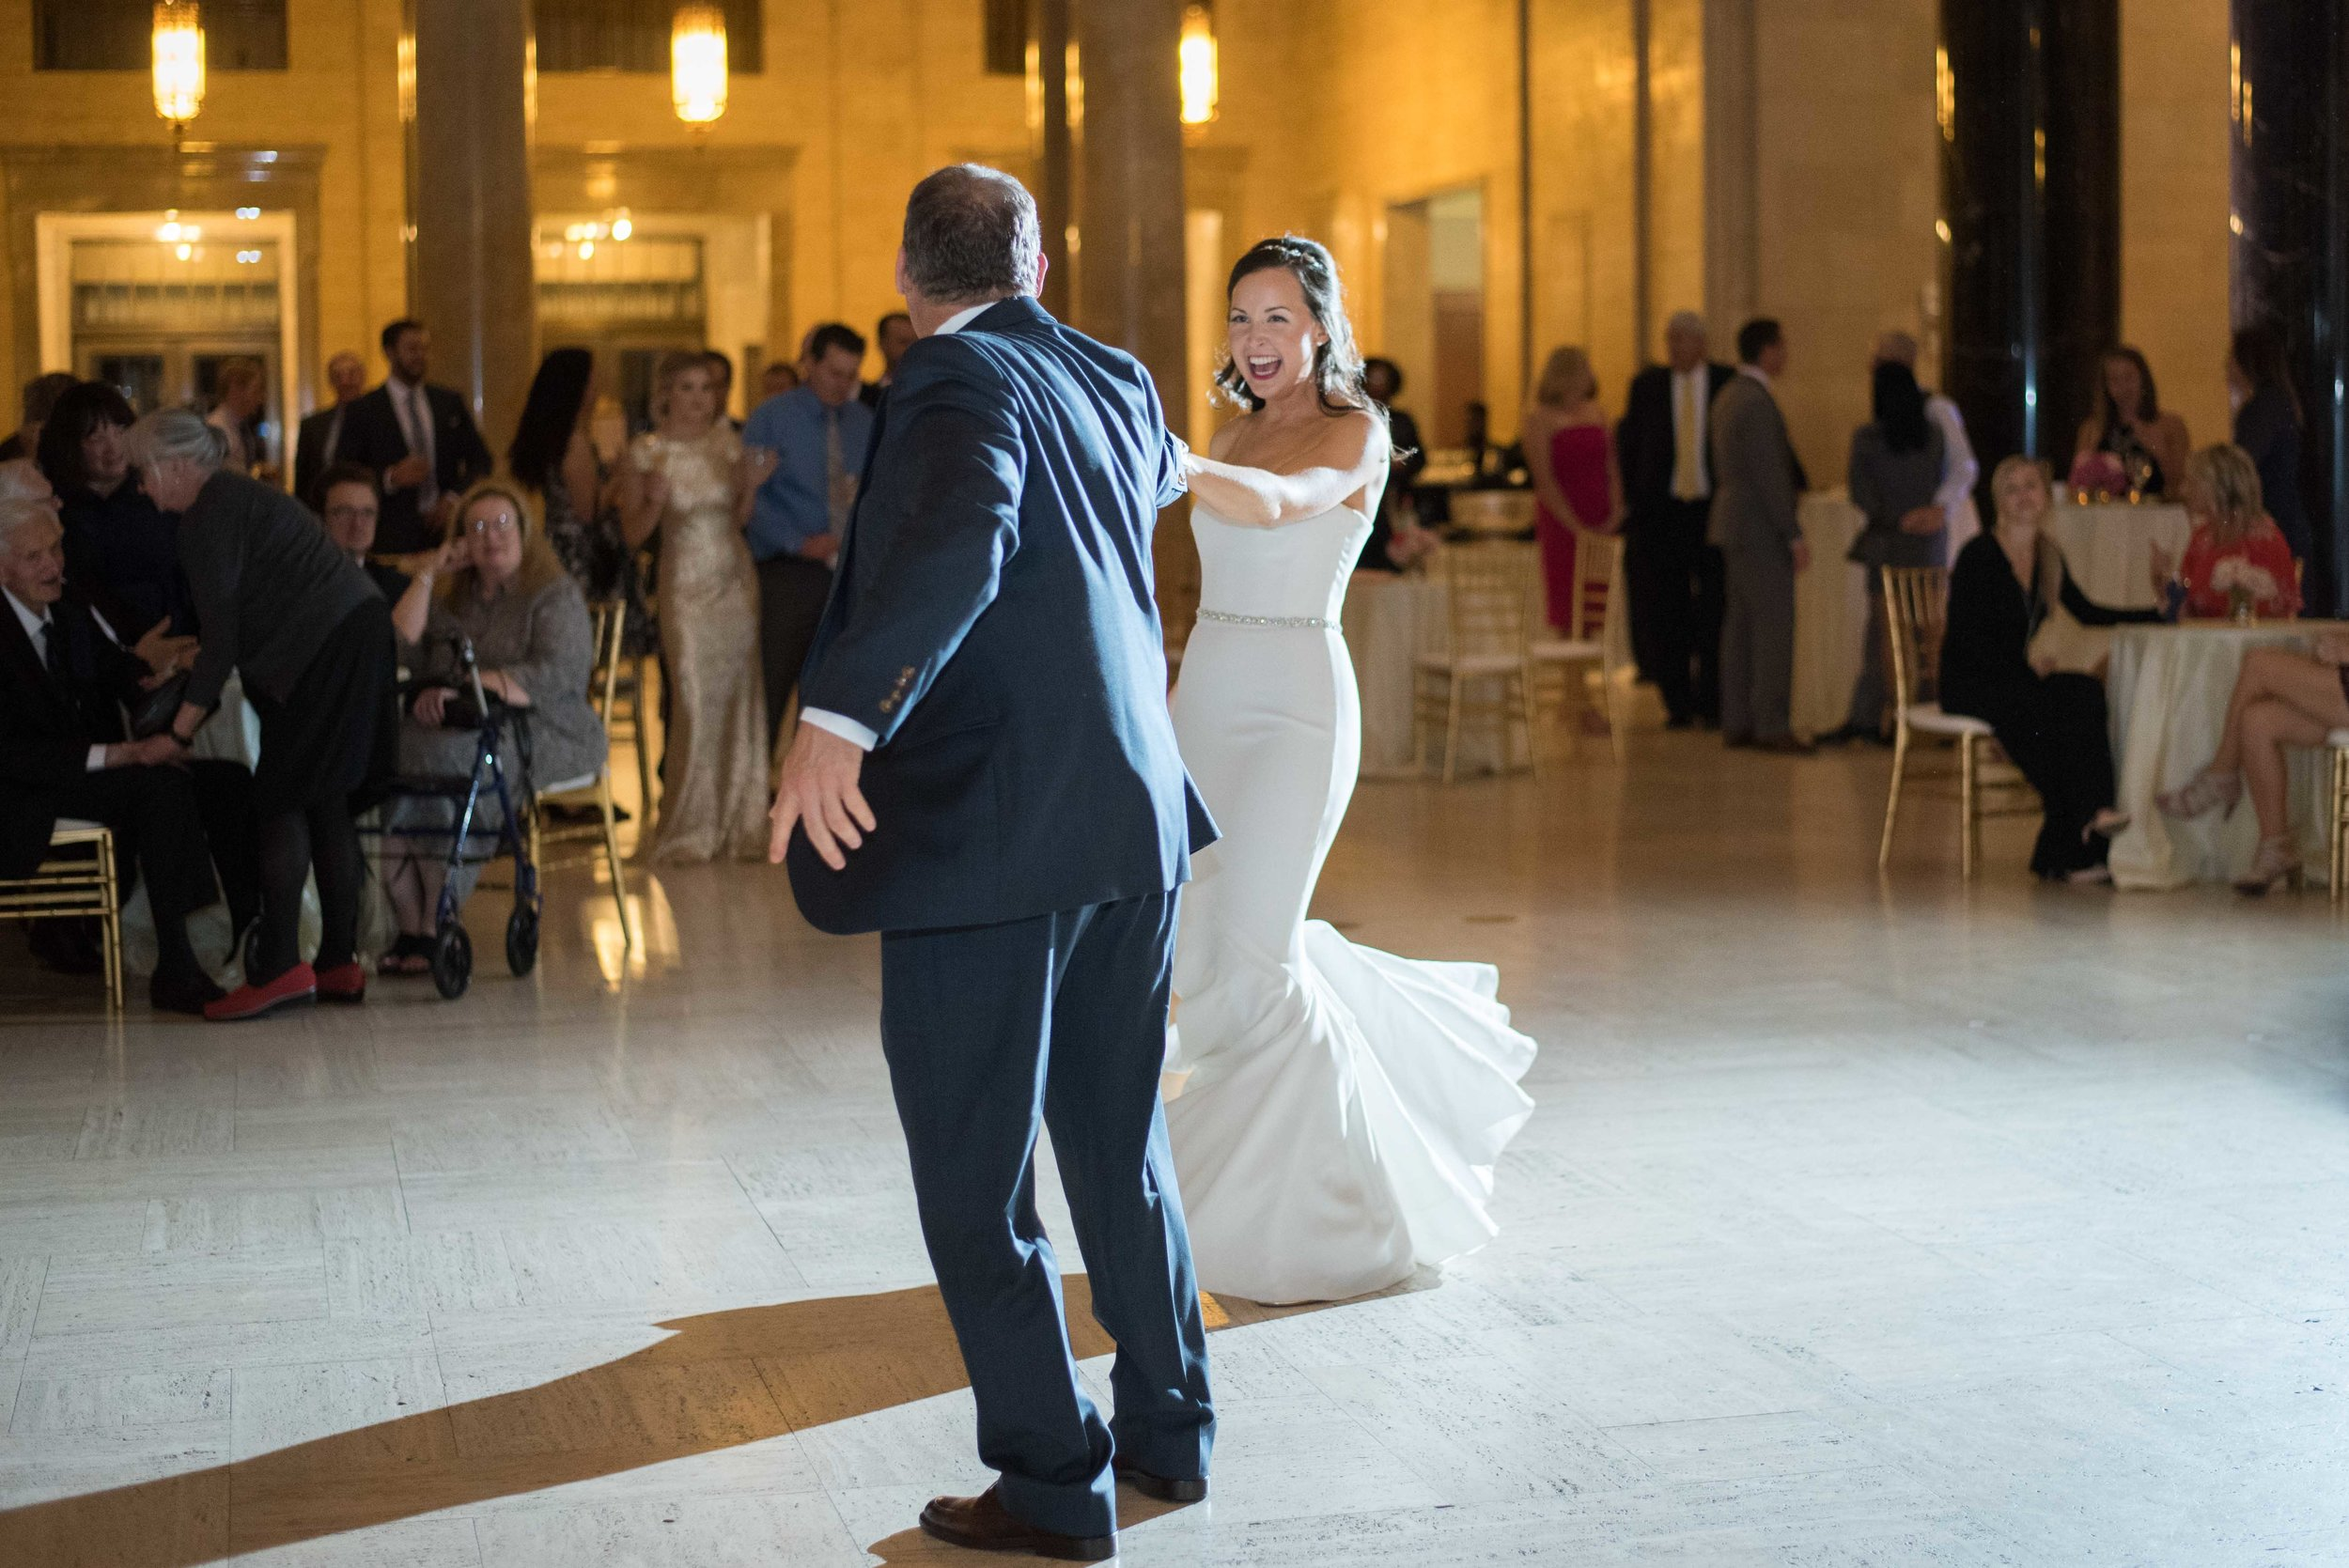 nelson-atkins-wedding-82.jpg